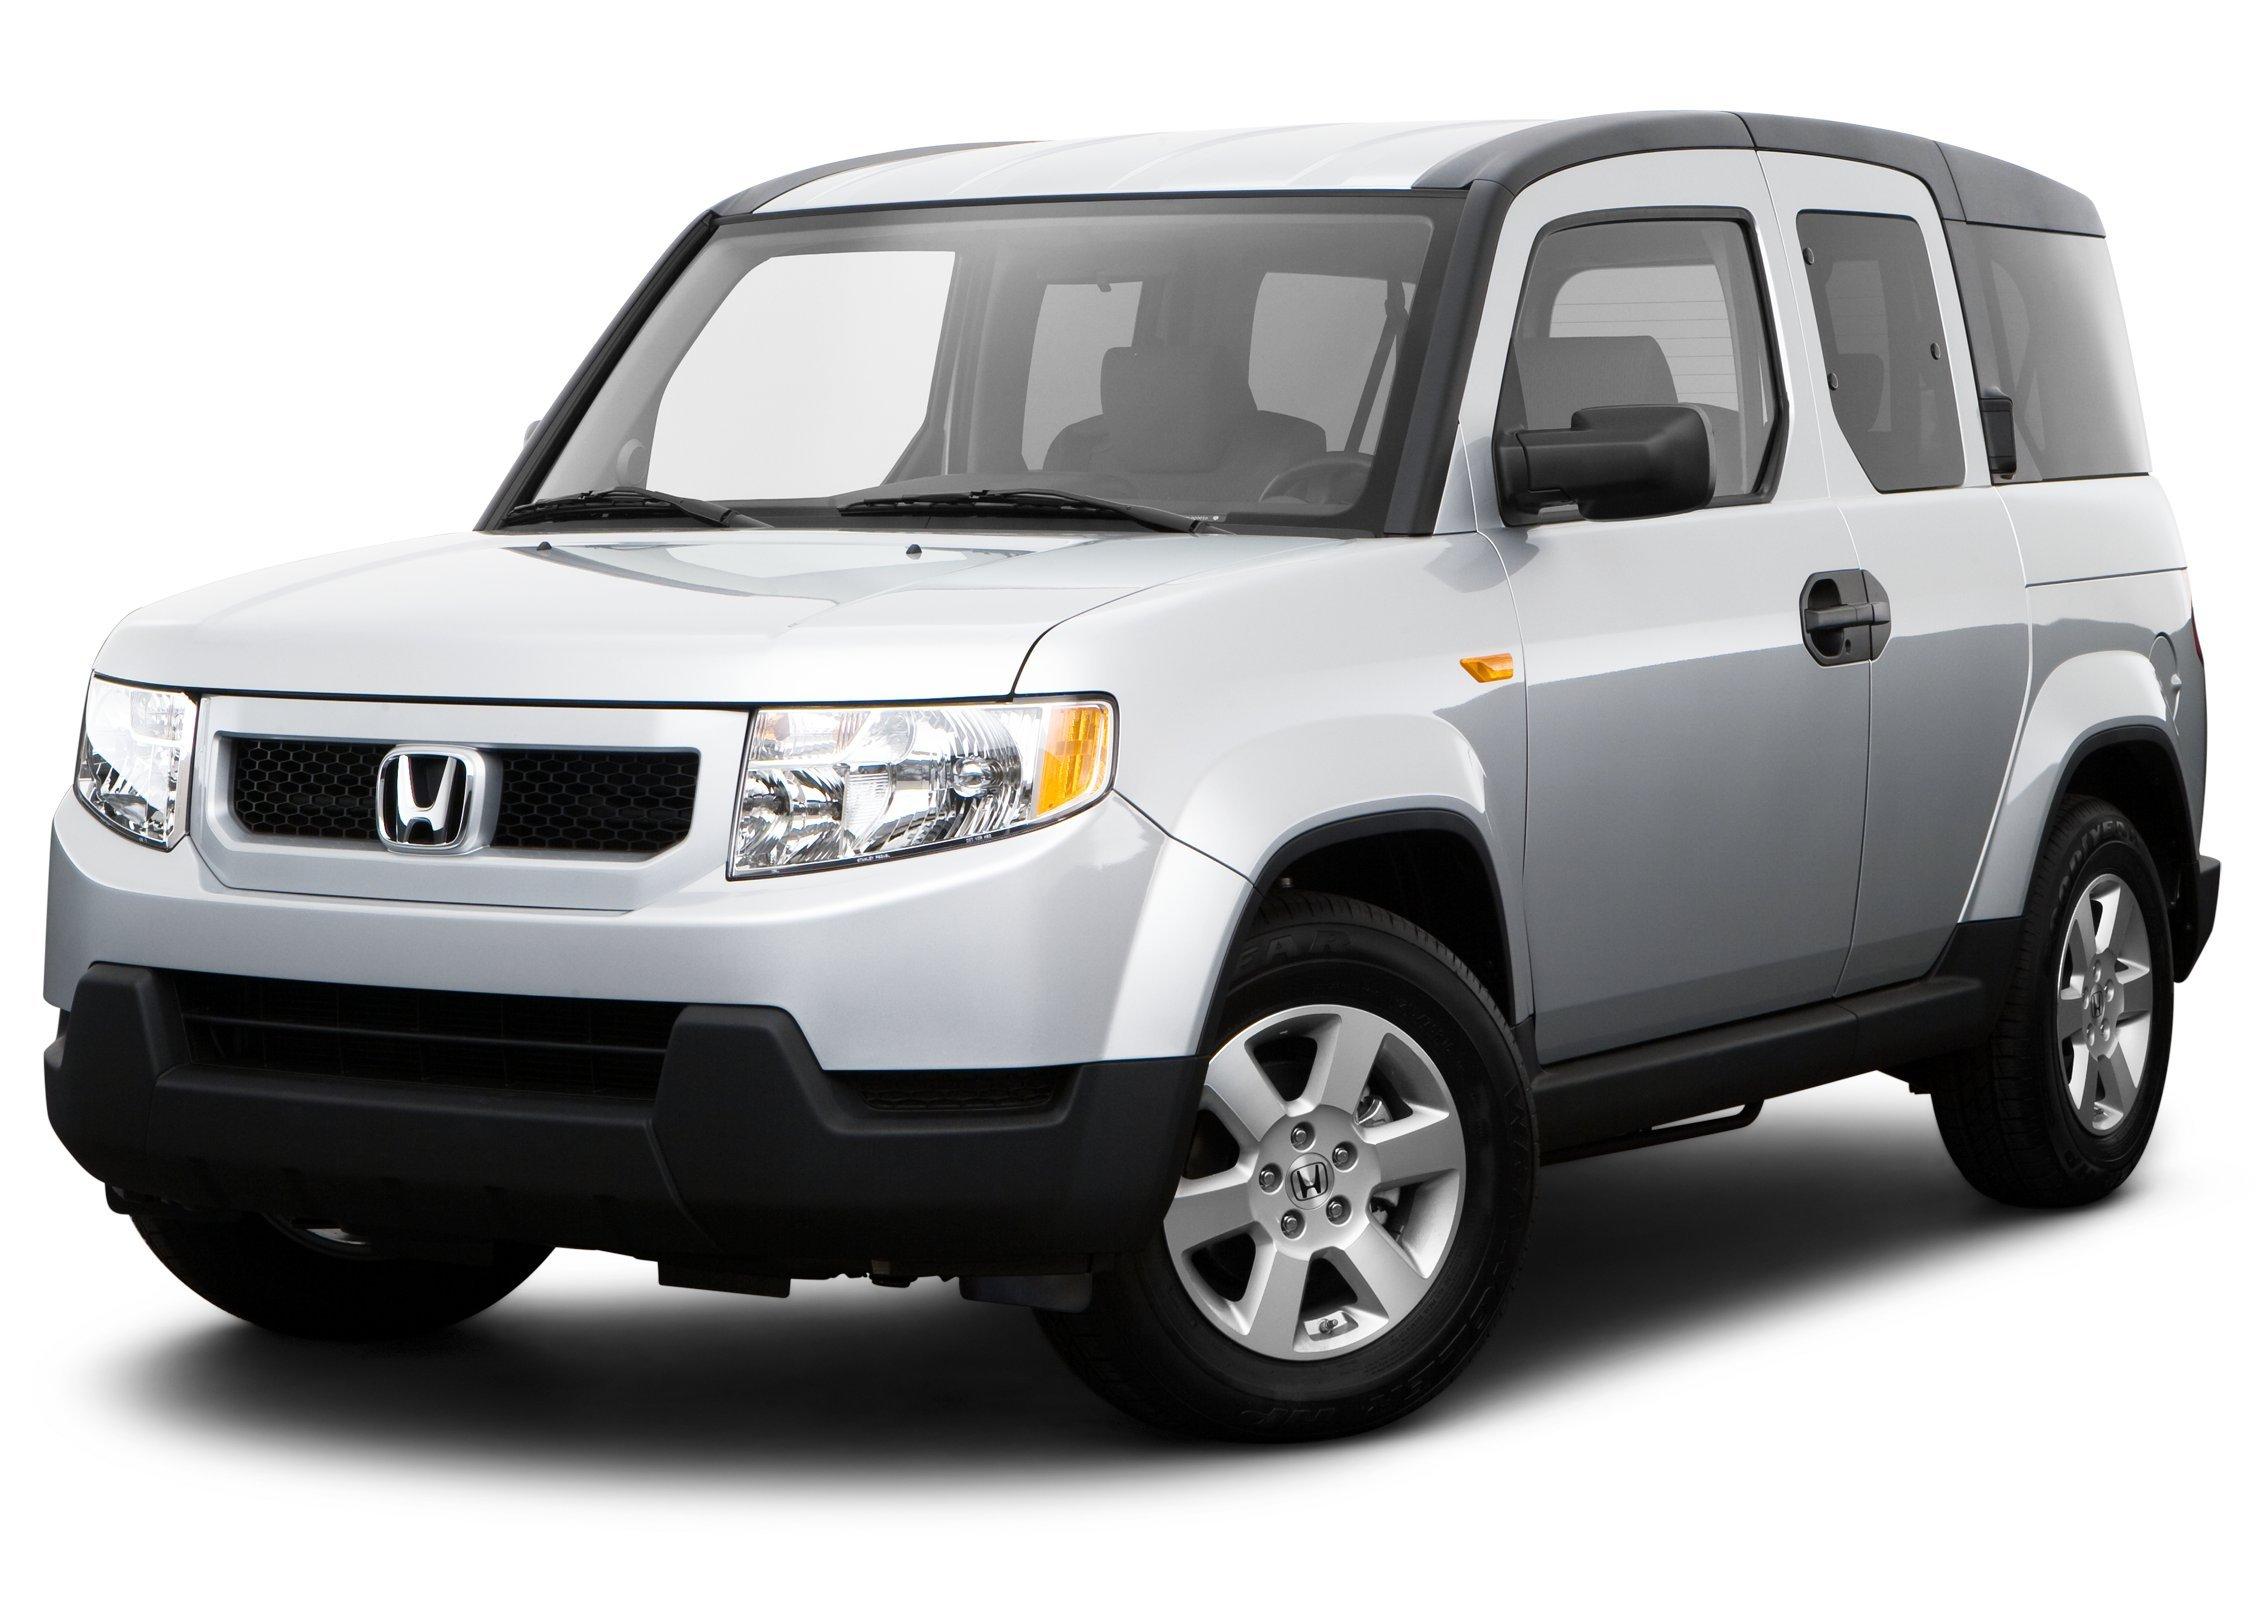 2009 Honda Element EX, 2-Wheel Drive 5-Door Automatic Transmission